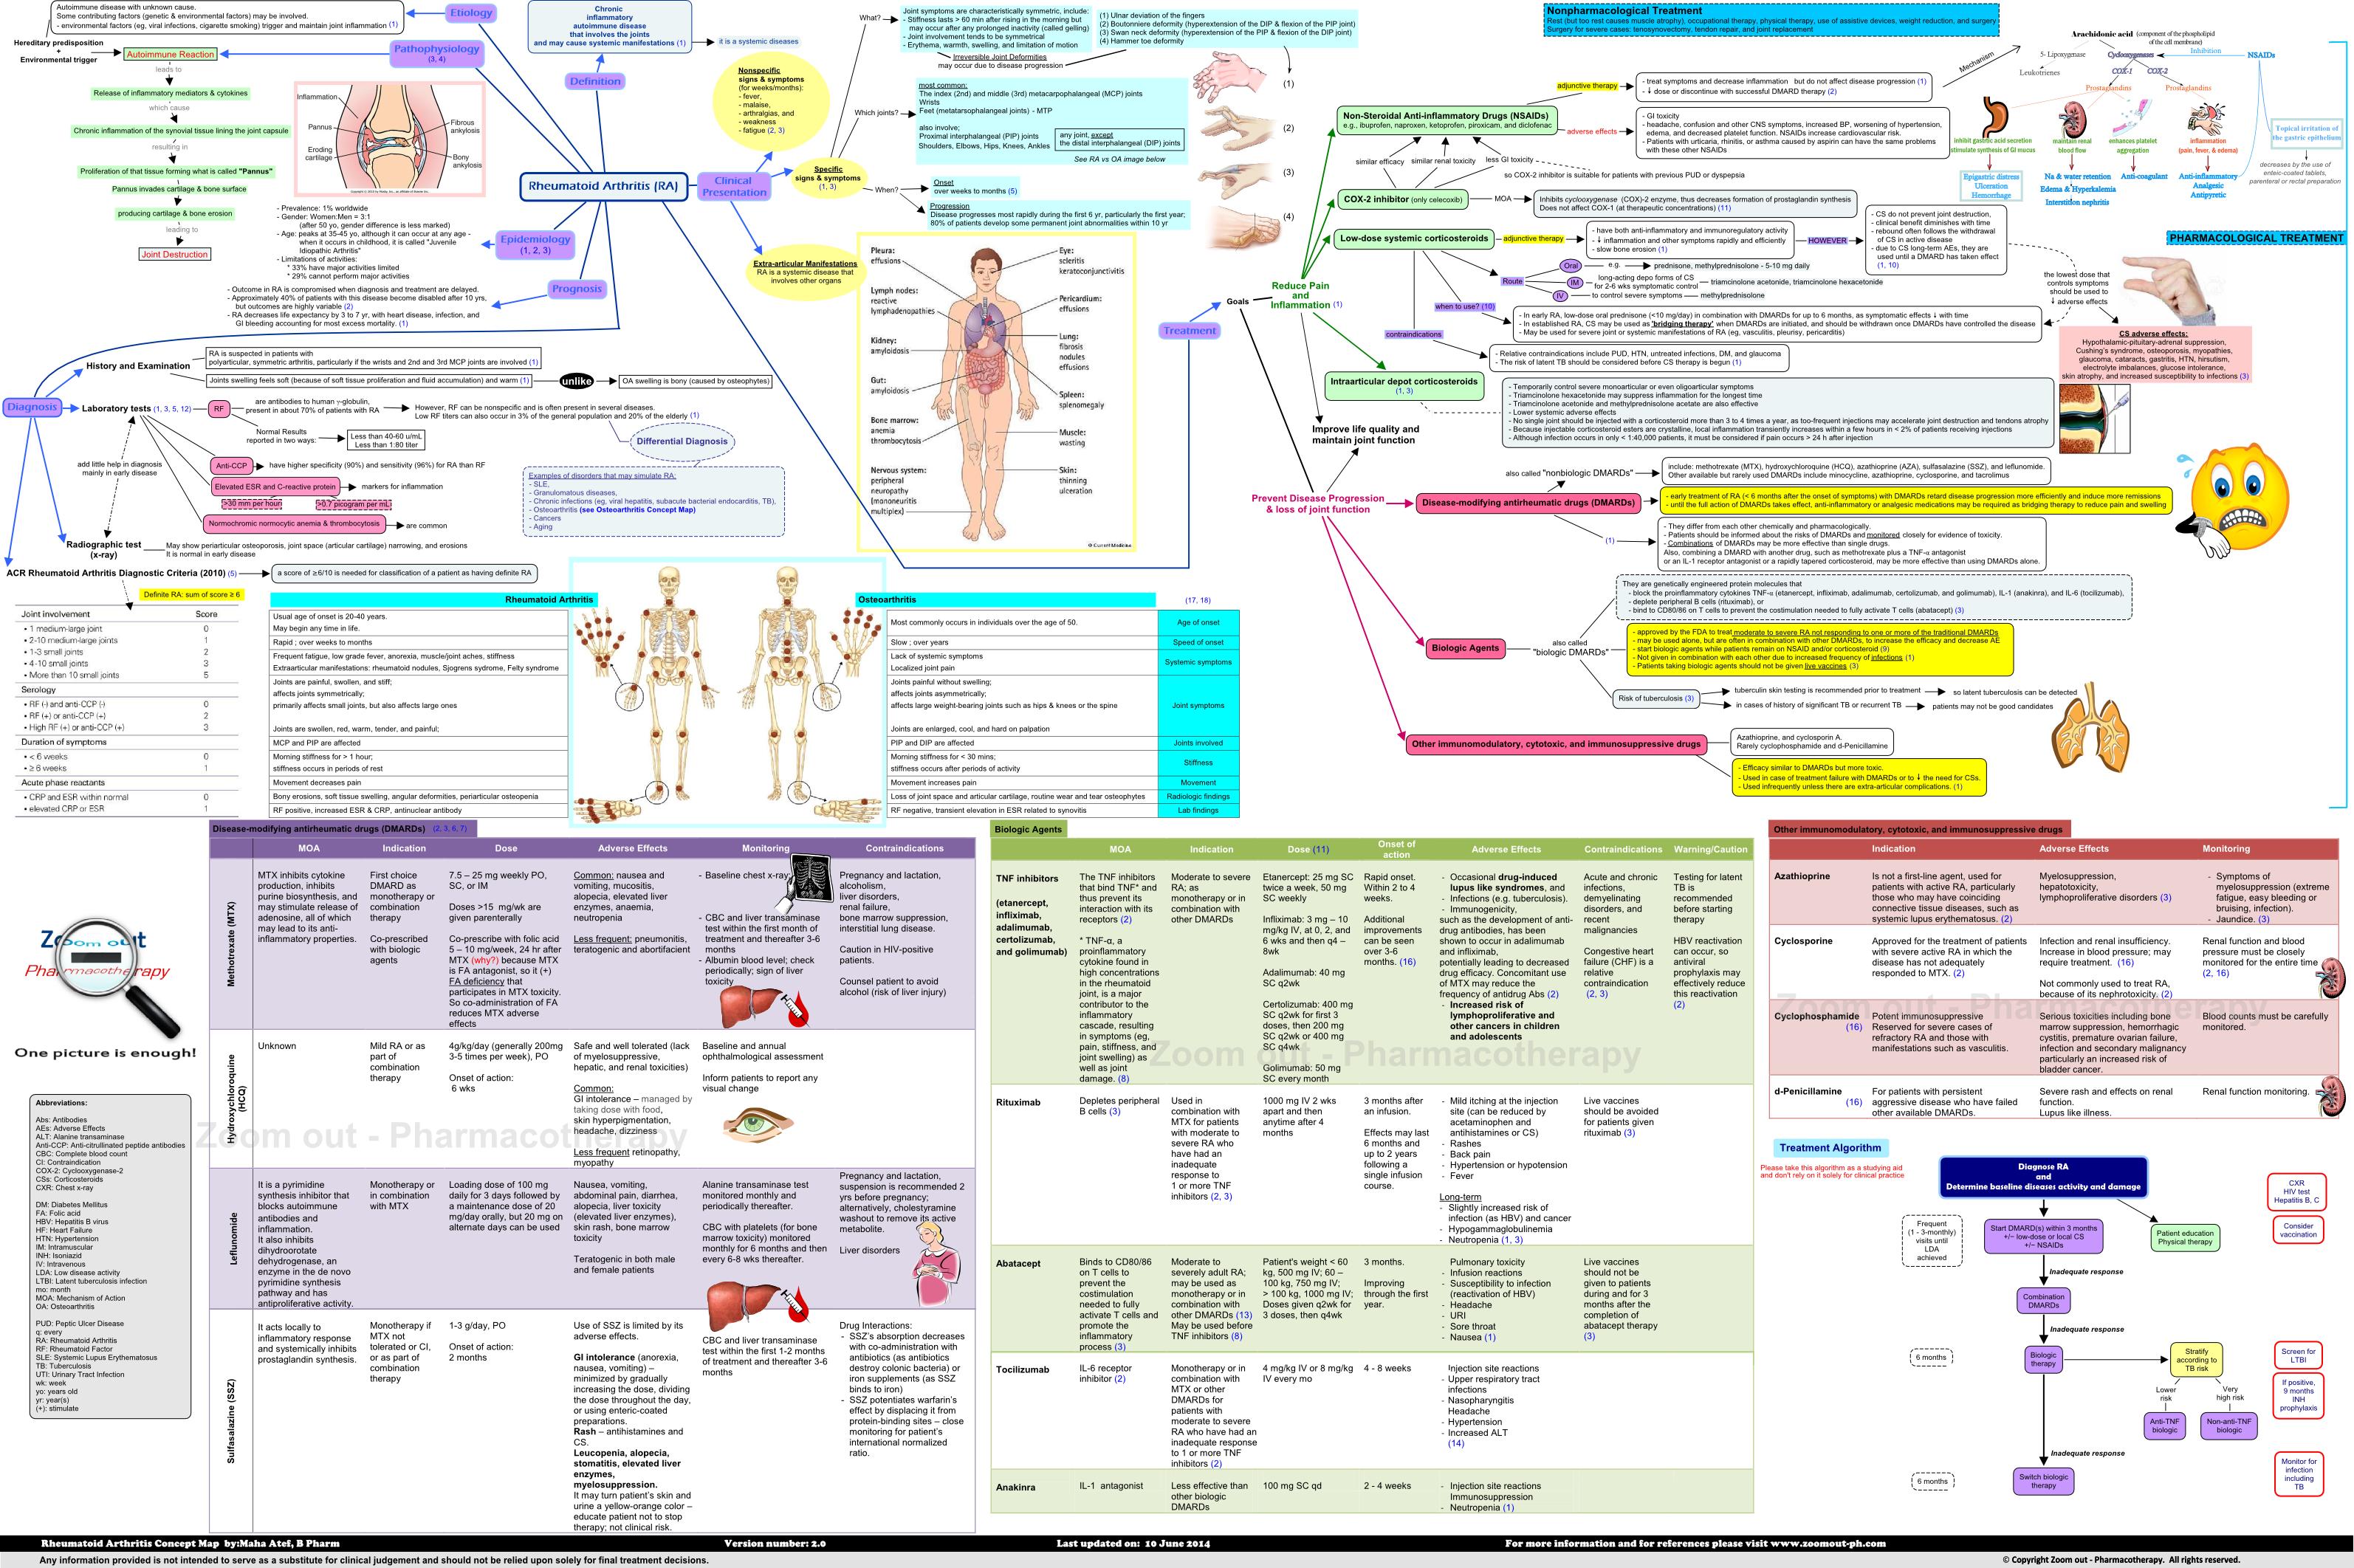 Rheumatoid Arthritis Concept Map